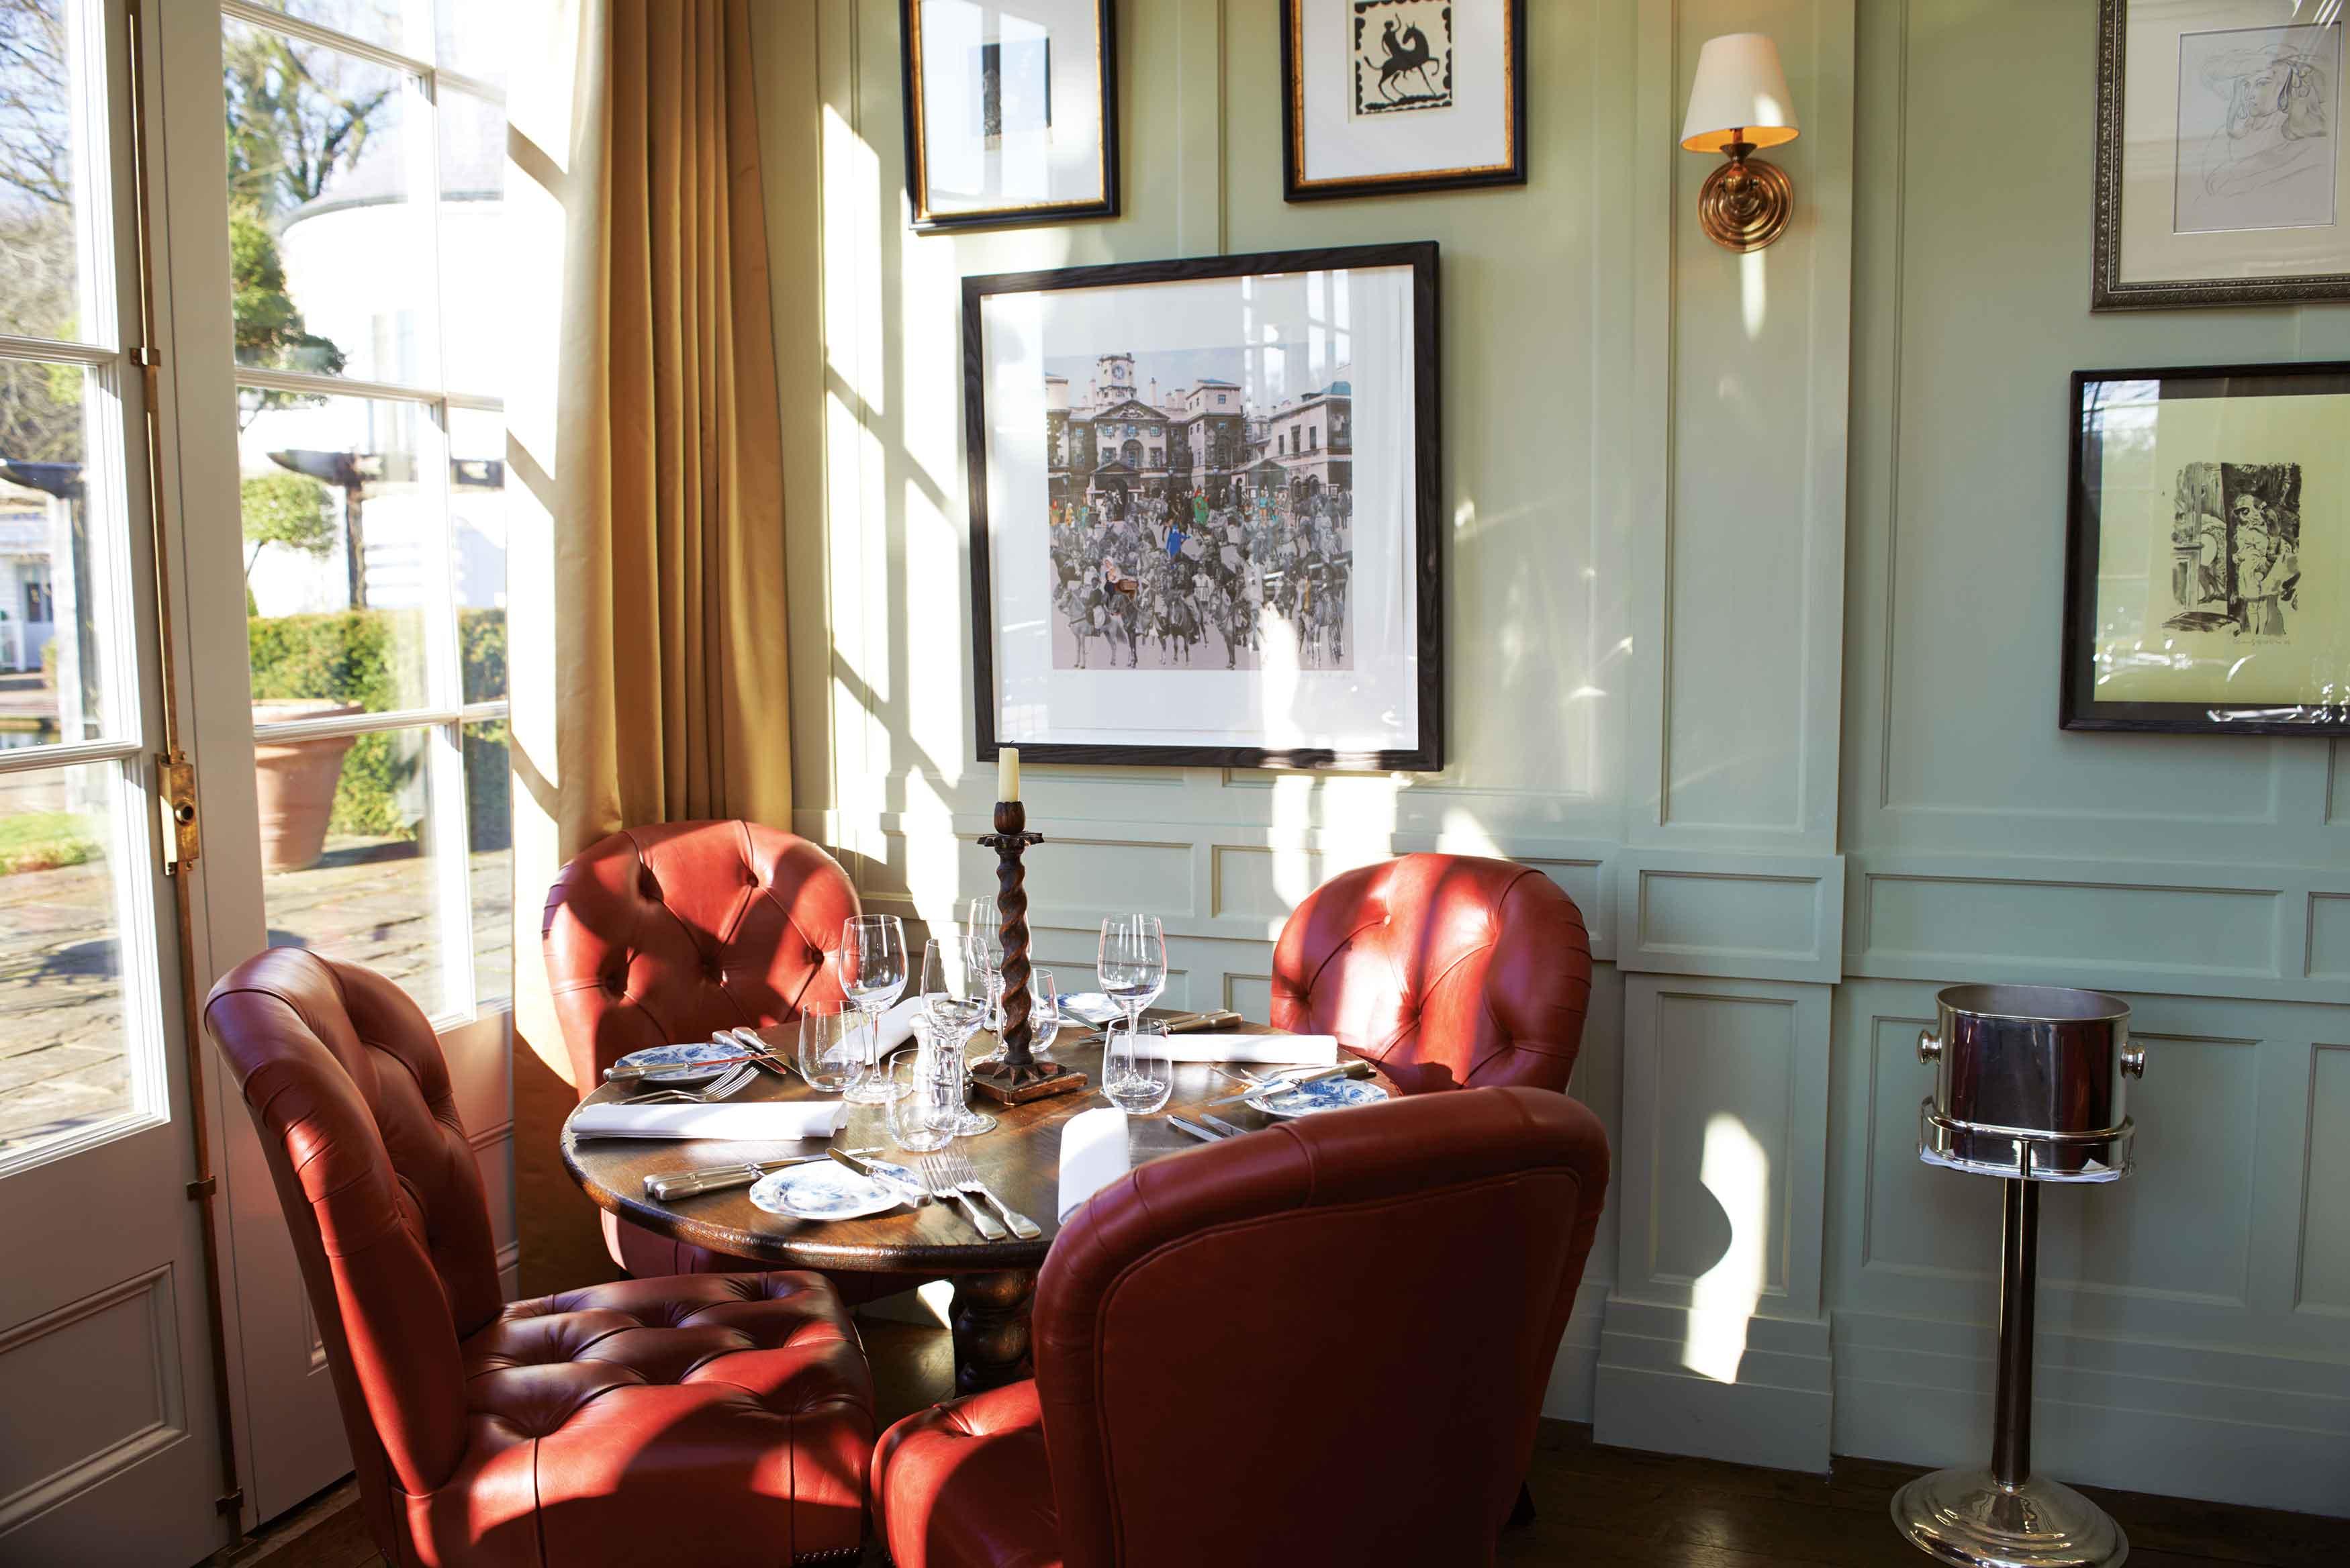 Interior Hartnett, Holder & Co di Hotel Lime Wood, Inggris.